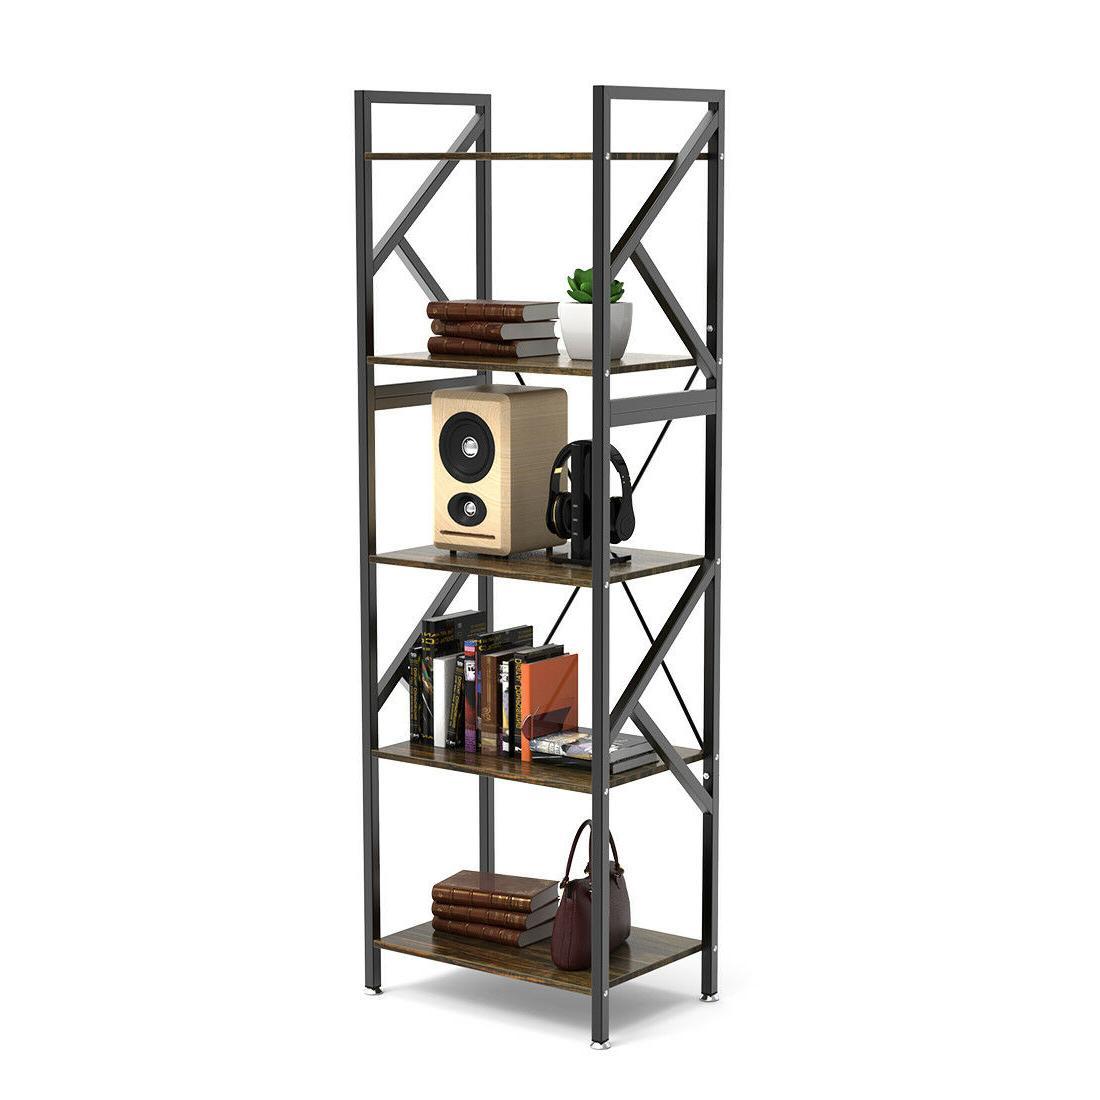 5 shelf bookshelf vintage industrial rustic rack